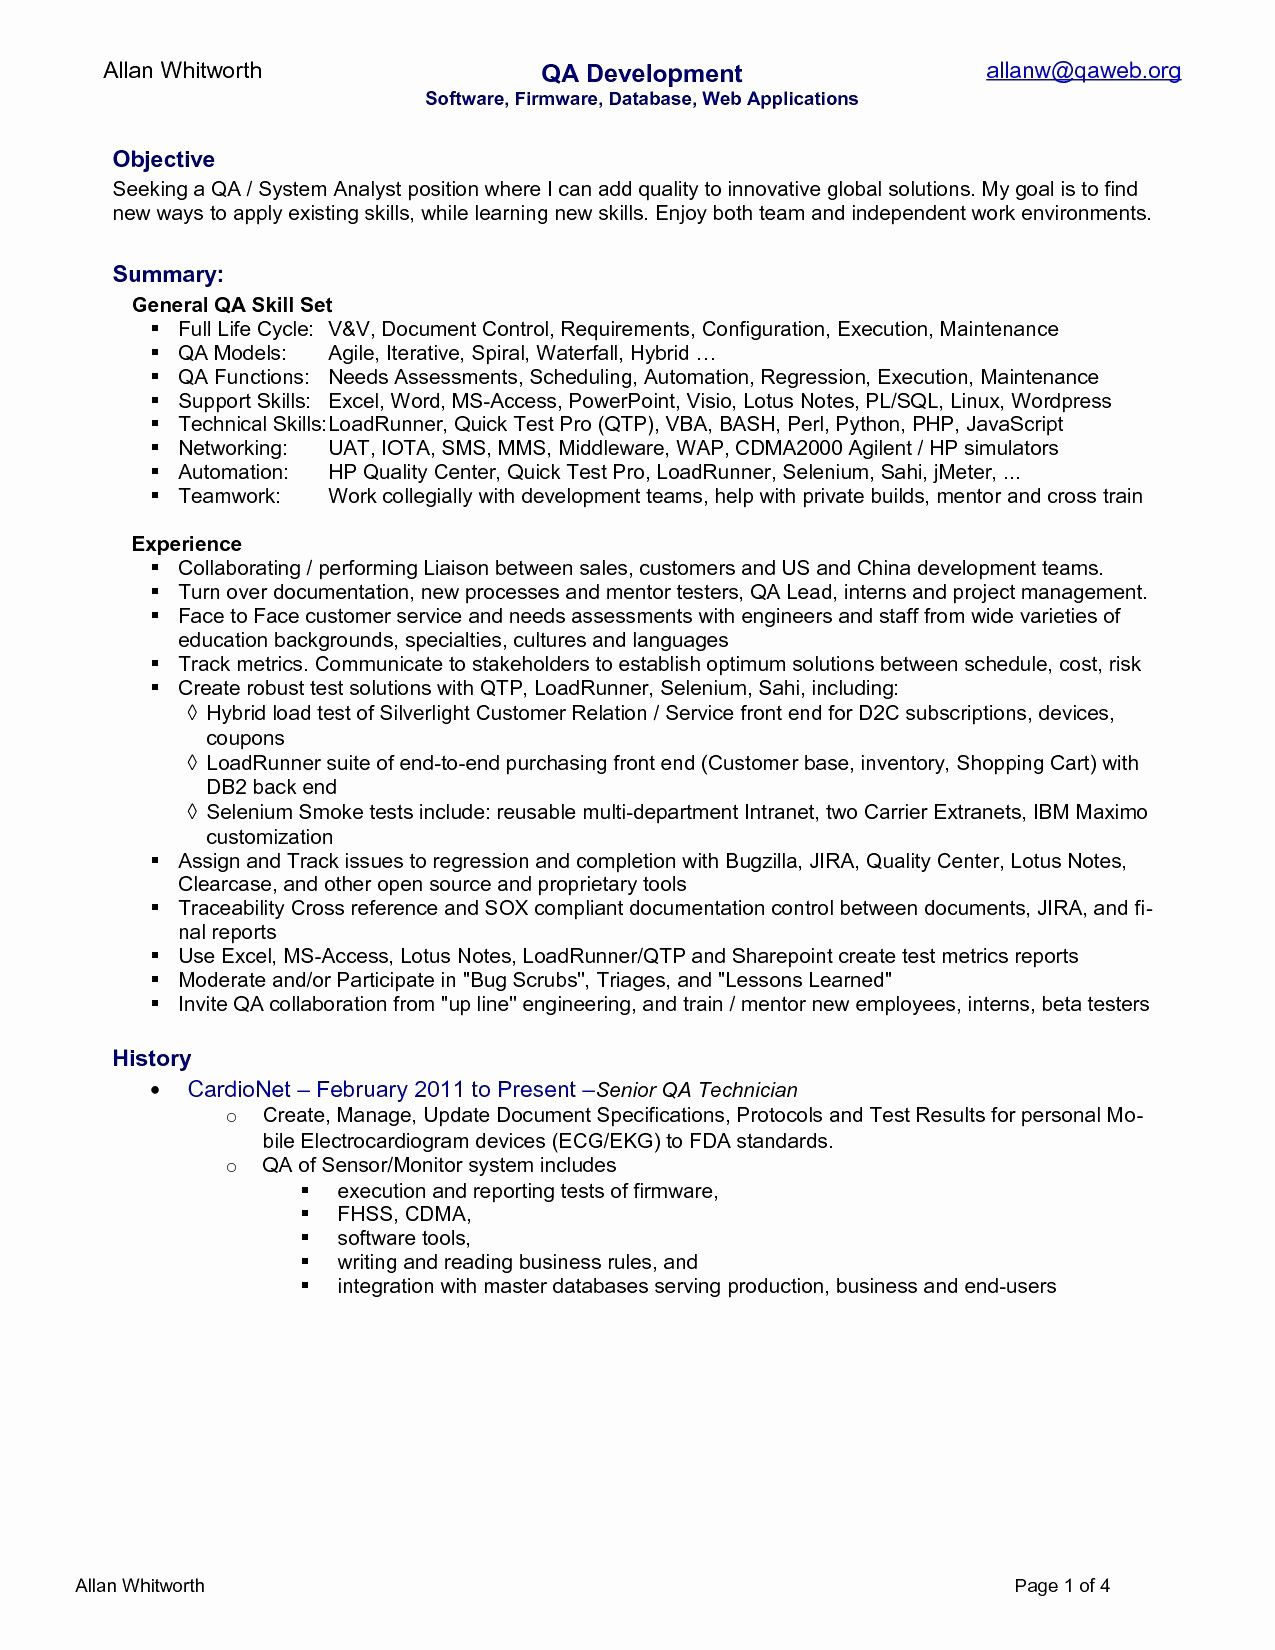 Resume Templates Virginia Tech ResumeTemplates